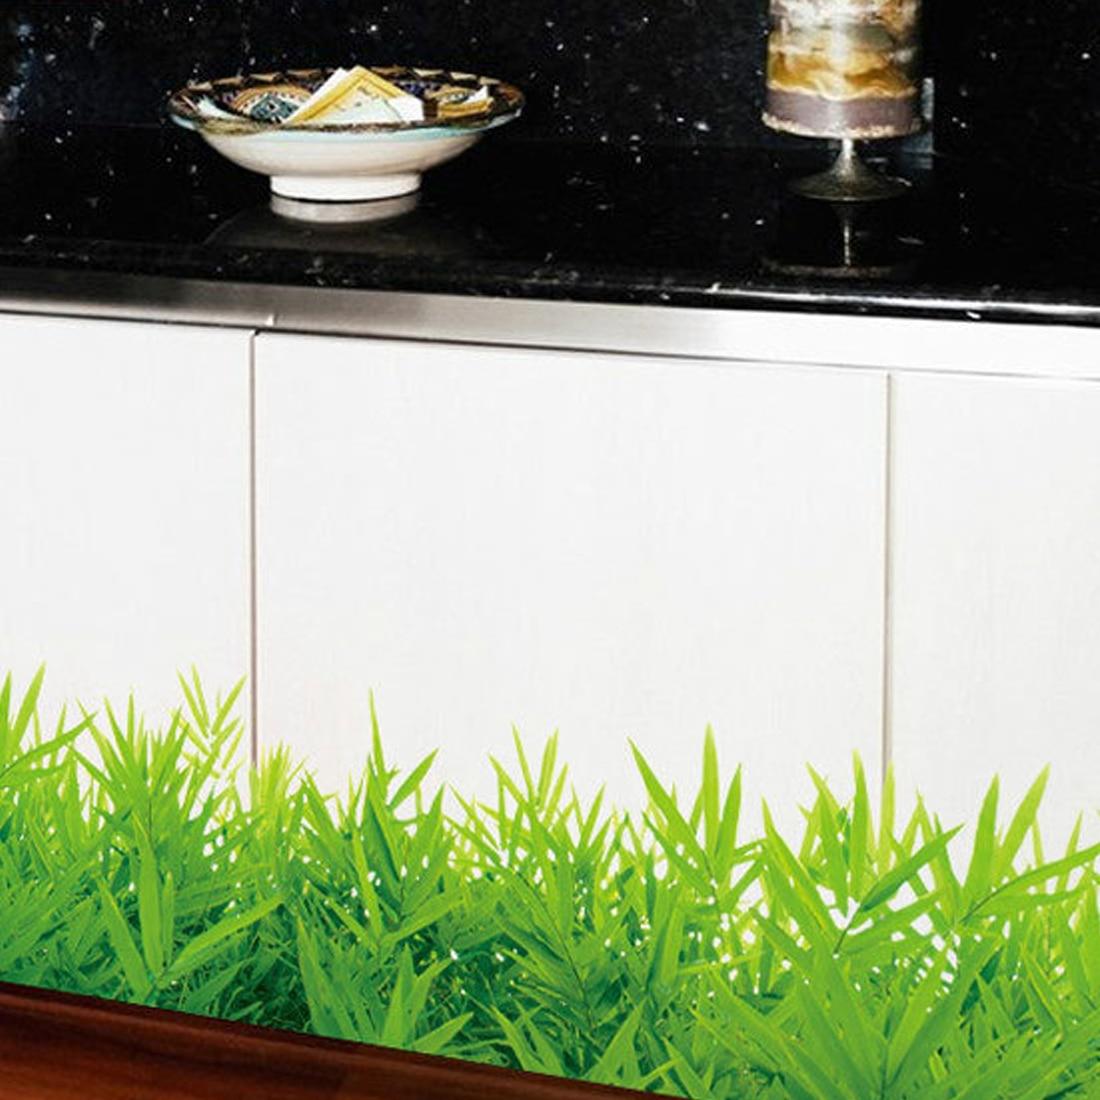 Nizza Baseboard Grüne gras wasserdicht DIY Abnehmbare Art Vinyl ...